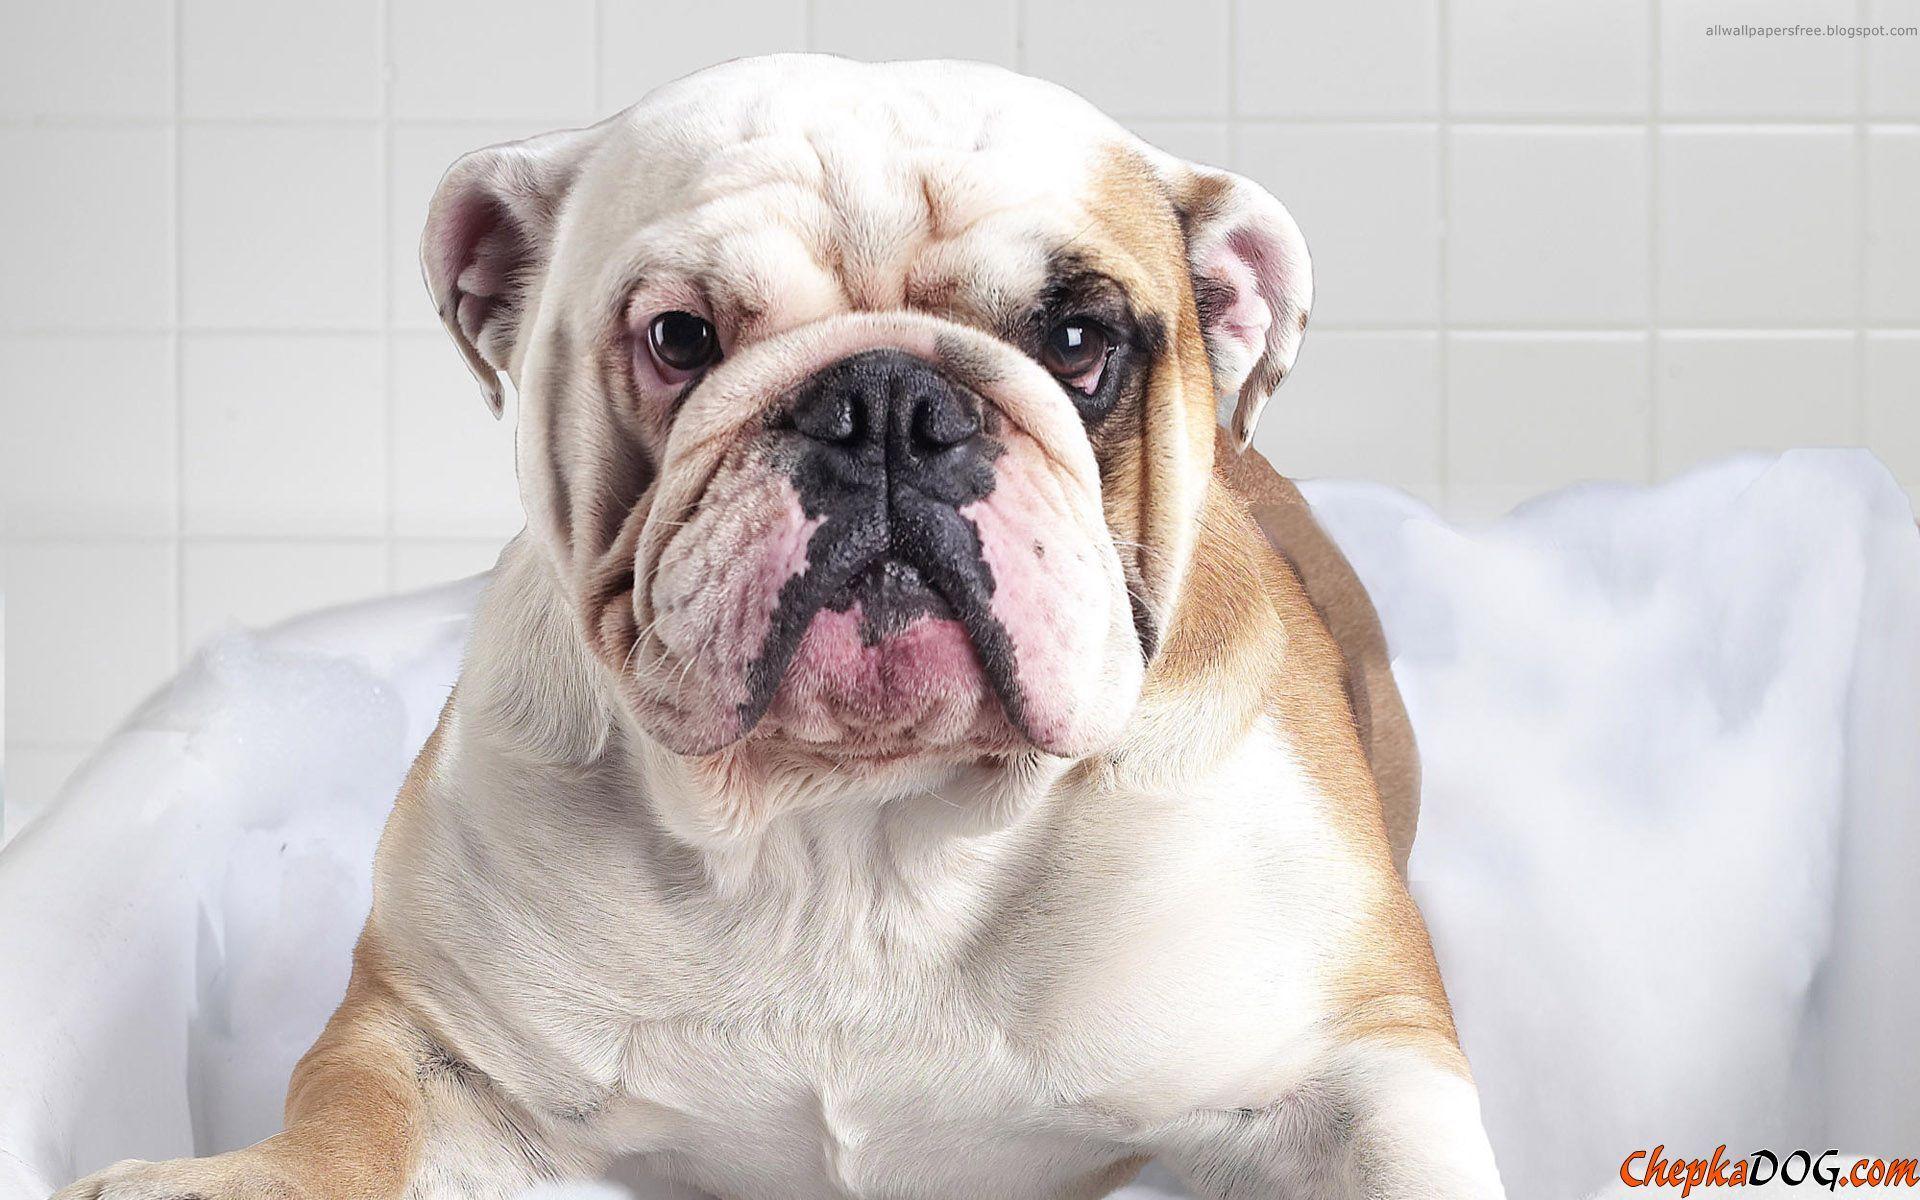 Cute english bulldog photo chepkadog en pinterest english